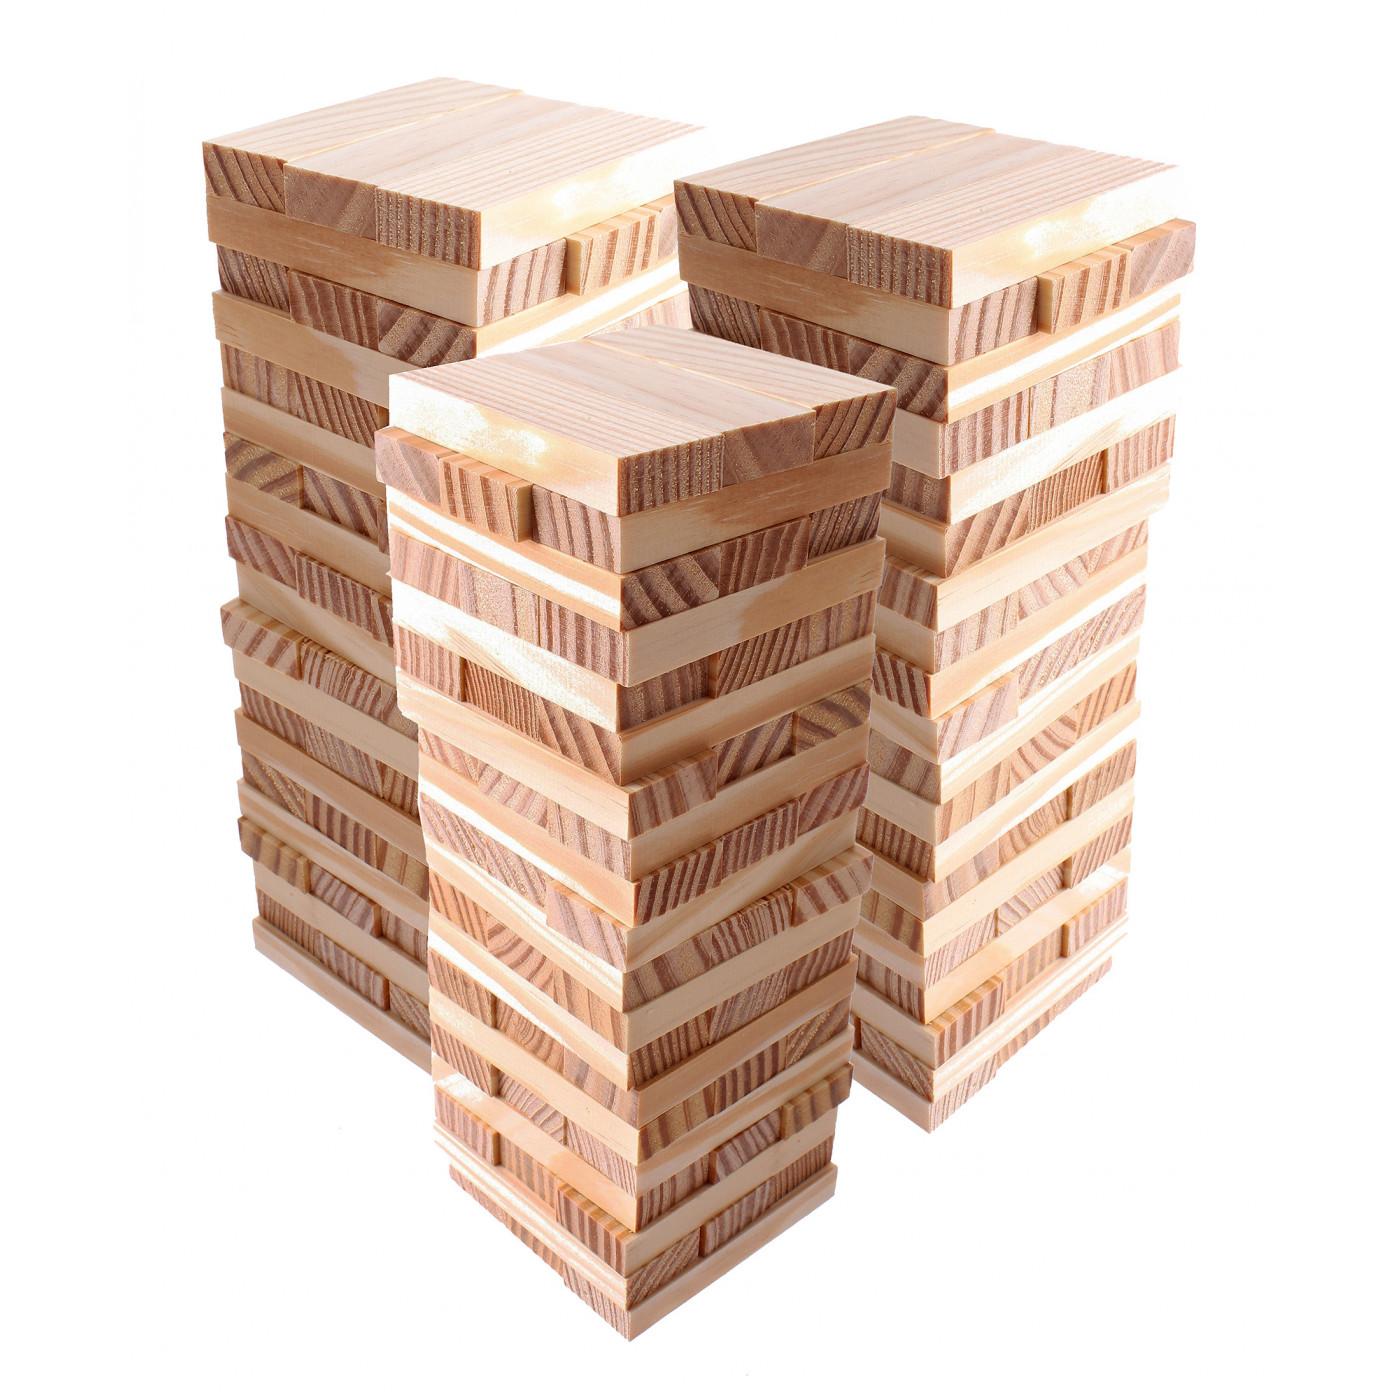 Set of 180 wooden blocks/sticks (7x2.3x1 cm)  - 1